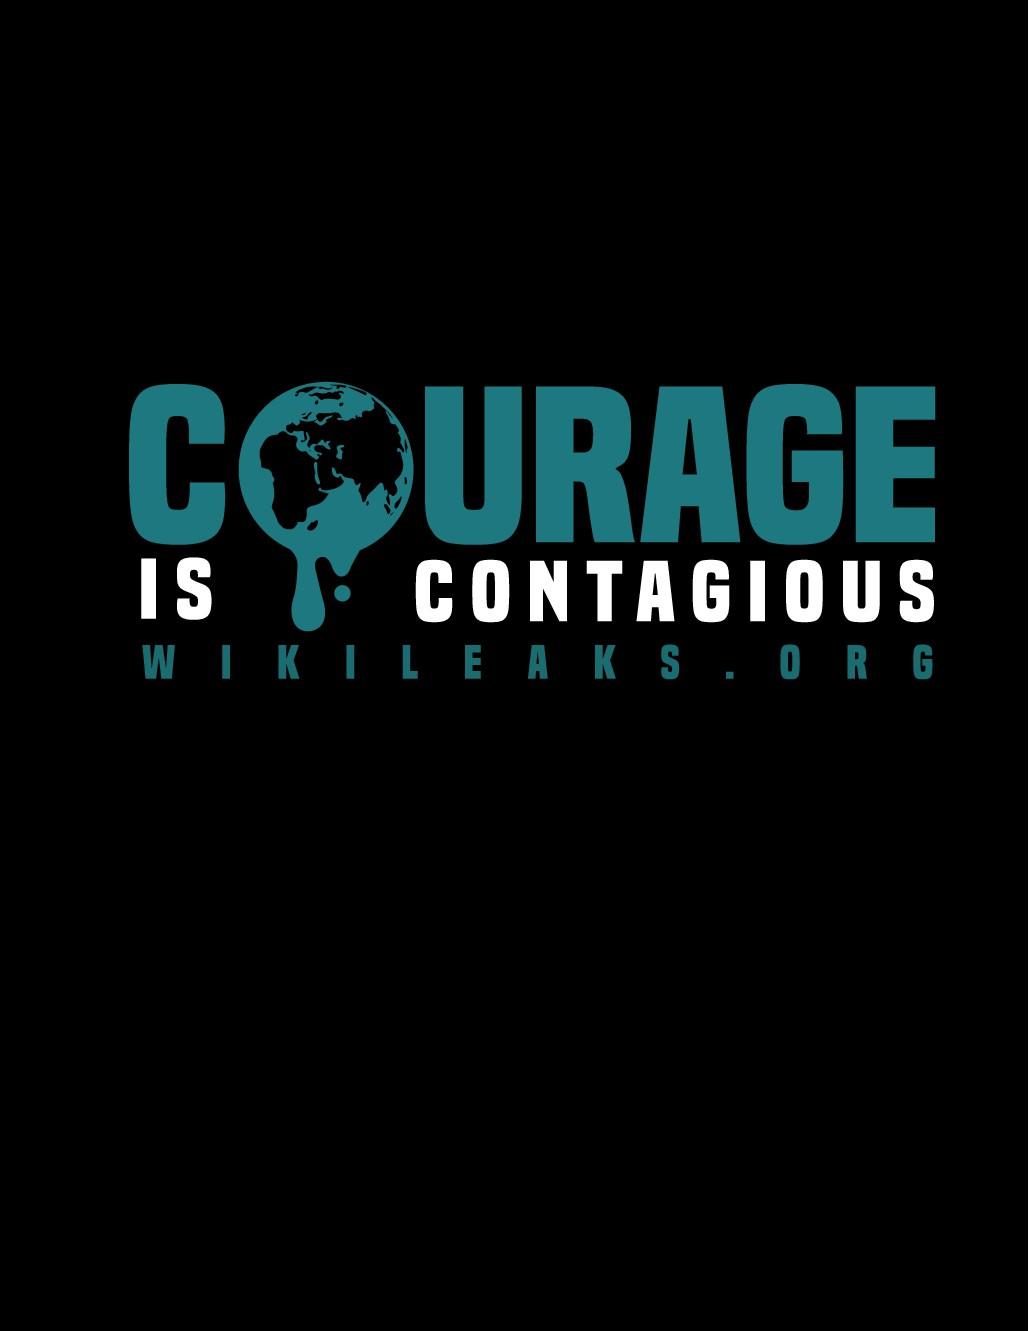 WikiLeaks *Courage* T-Shirt Design Contest - 2 Winning Designs will be chosen